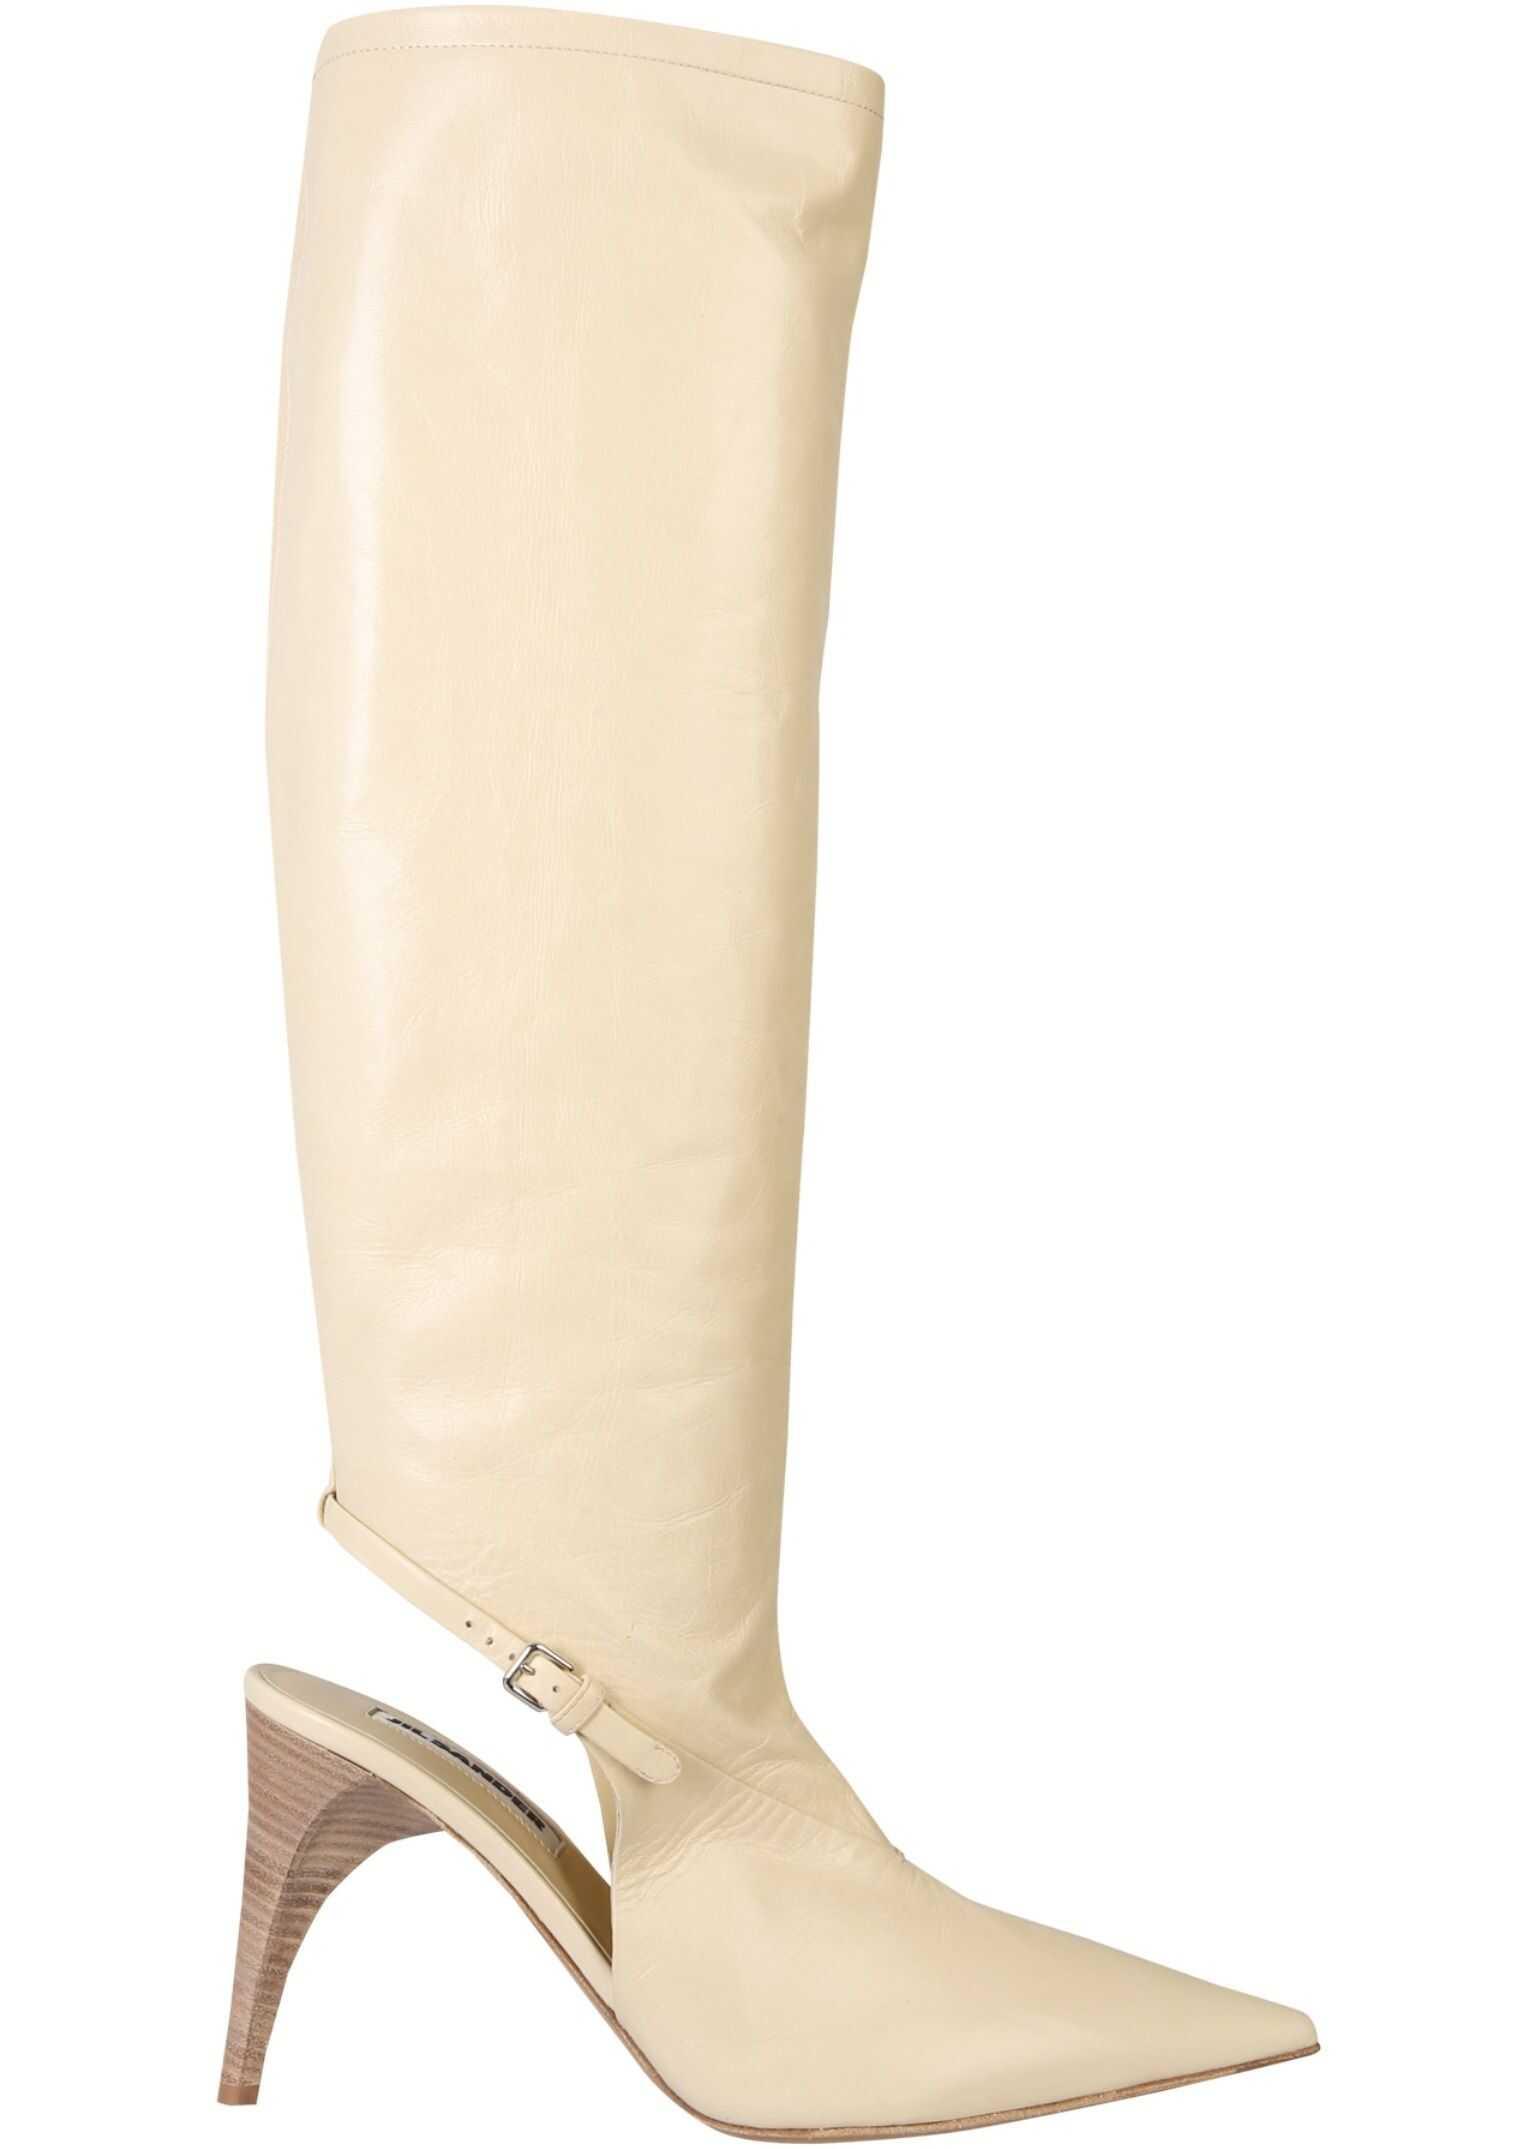 Jil Sander High Sling Back Boots JS35124A_12011103 WHITE imagine b-mall.ro